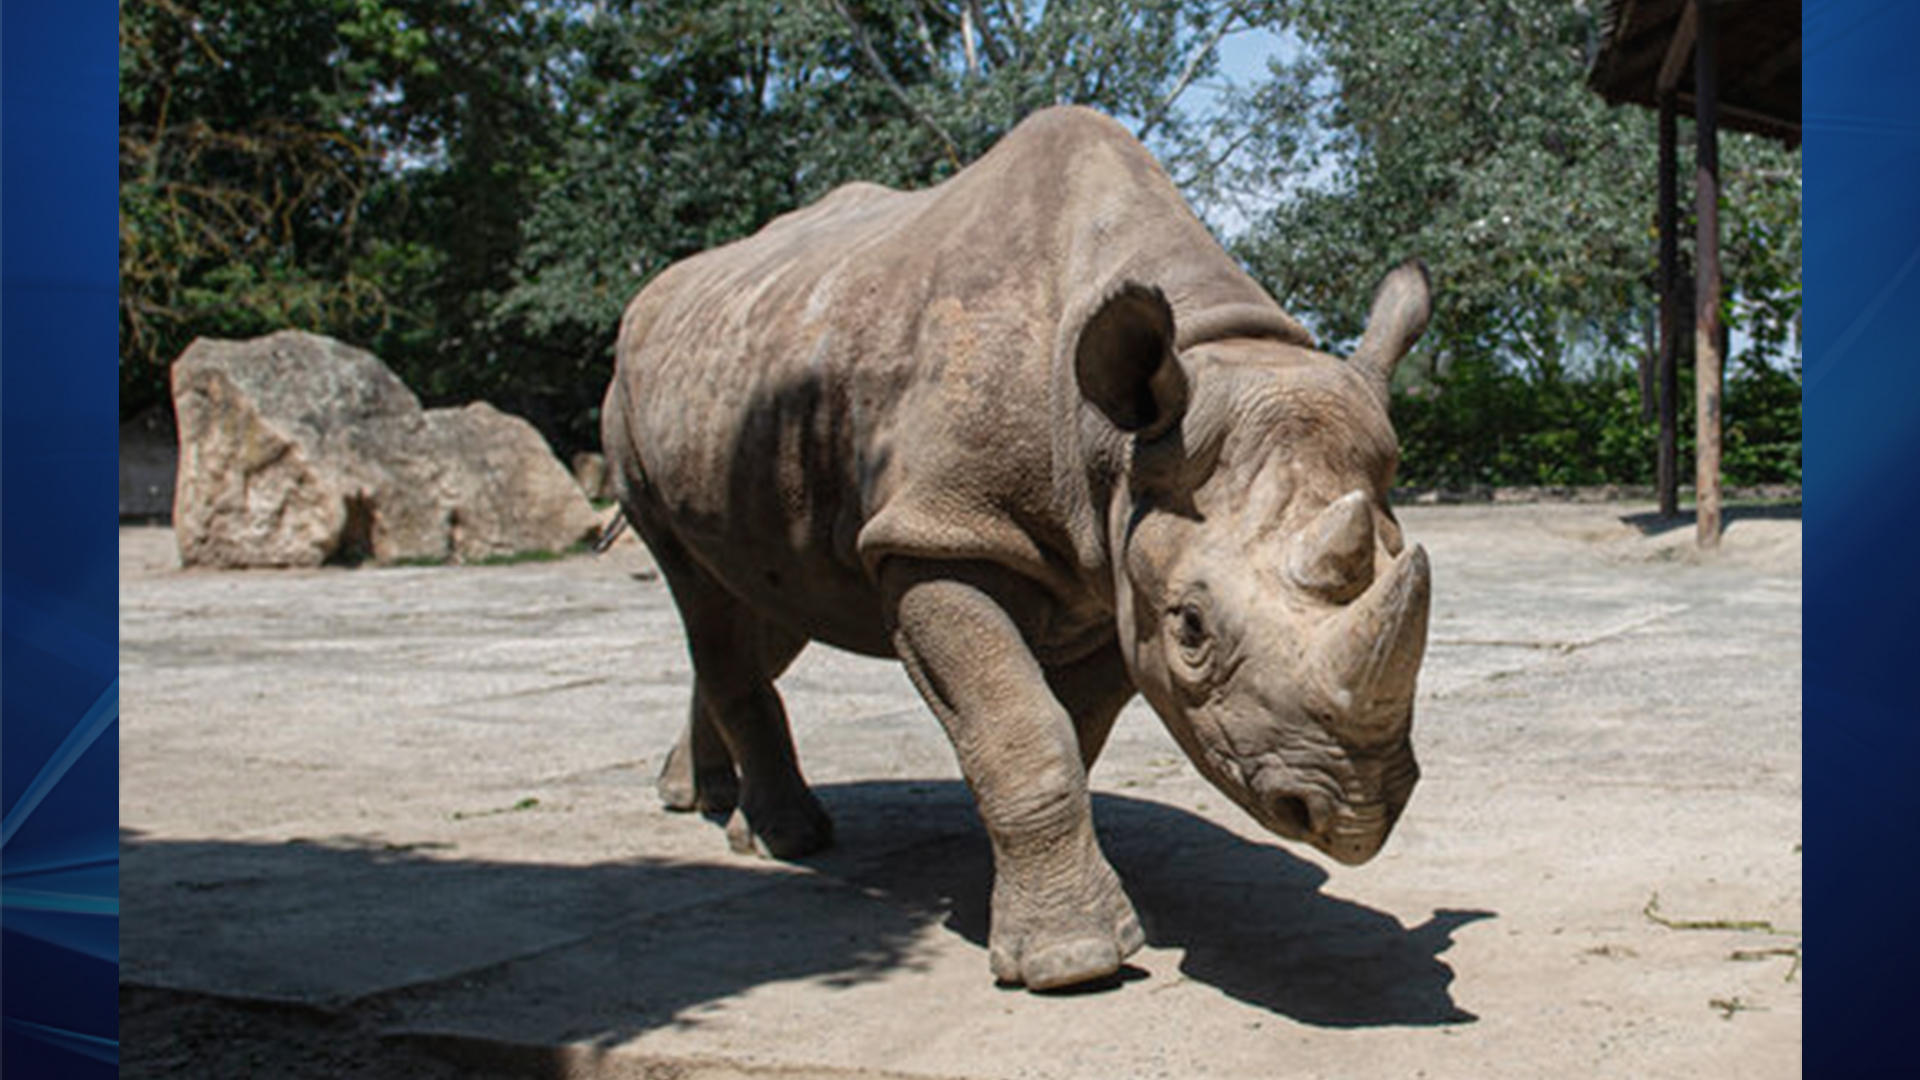 Rhino_1561482184520.jpg